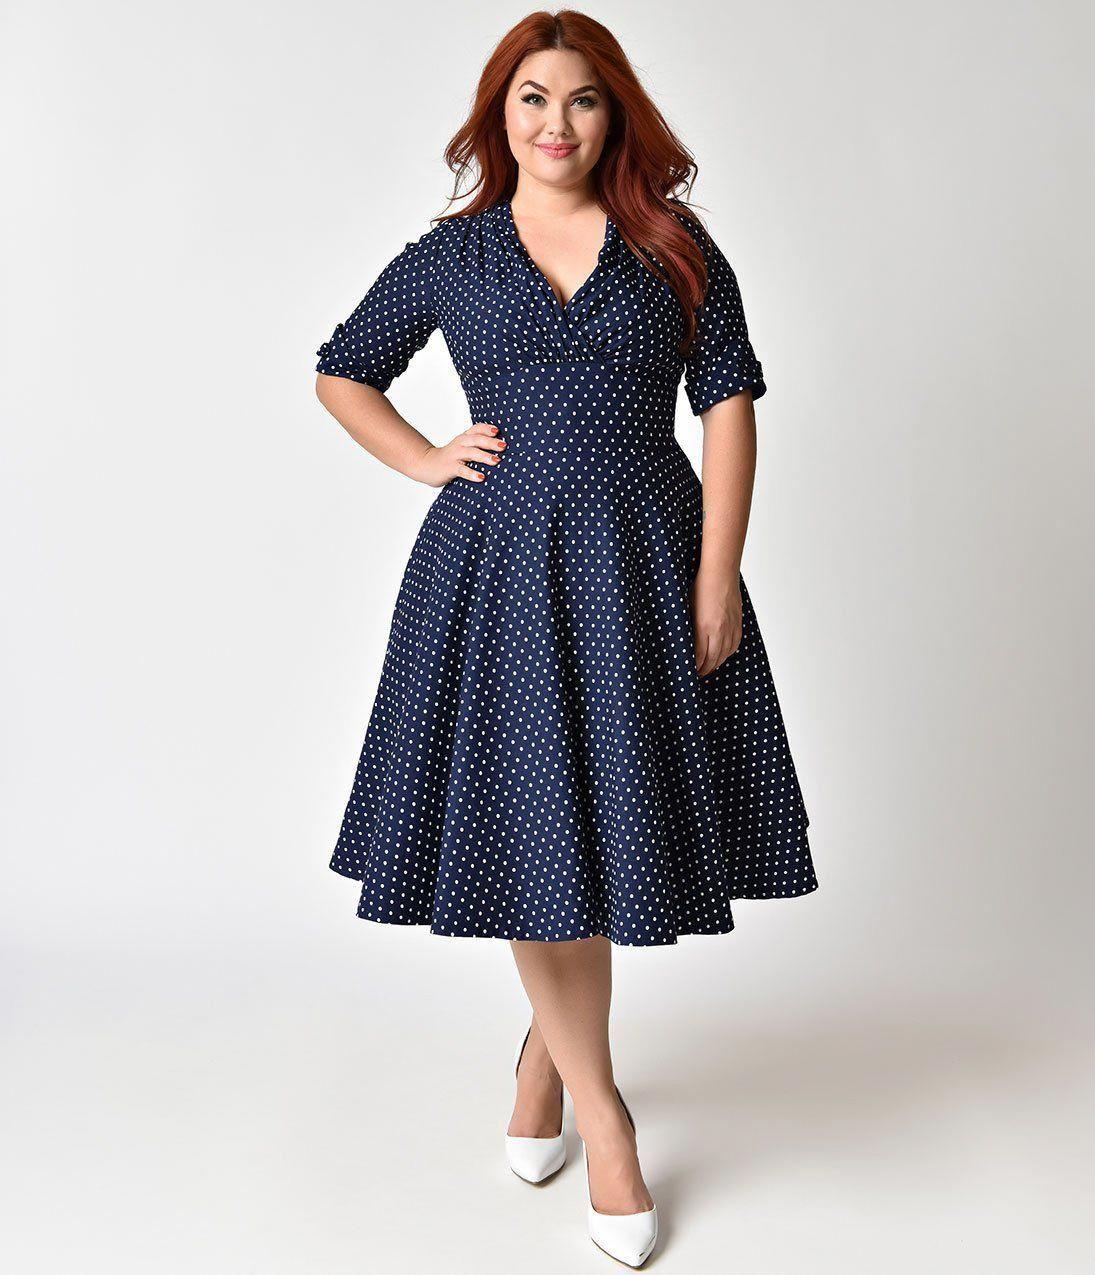 1950s Plus Size Dresses Clothing Plus Size Swing Dresses Unique Vintage Plus Size 1950s Navy Plus Size Sundress Dresses For Apple Shape Women Dresses Classy [ 1275 x 1095 Pixel ]